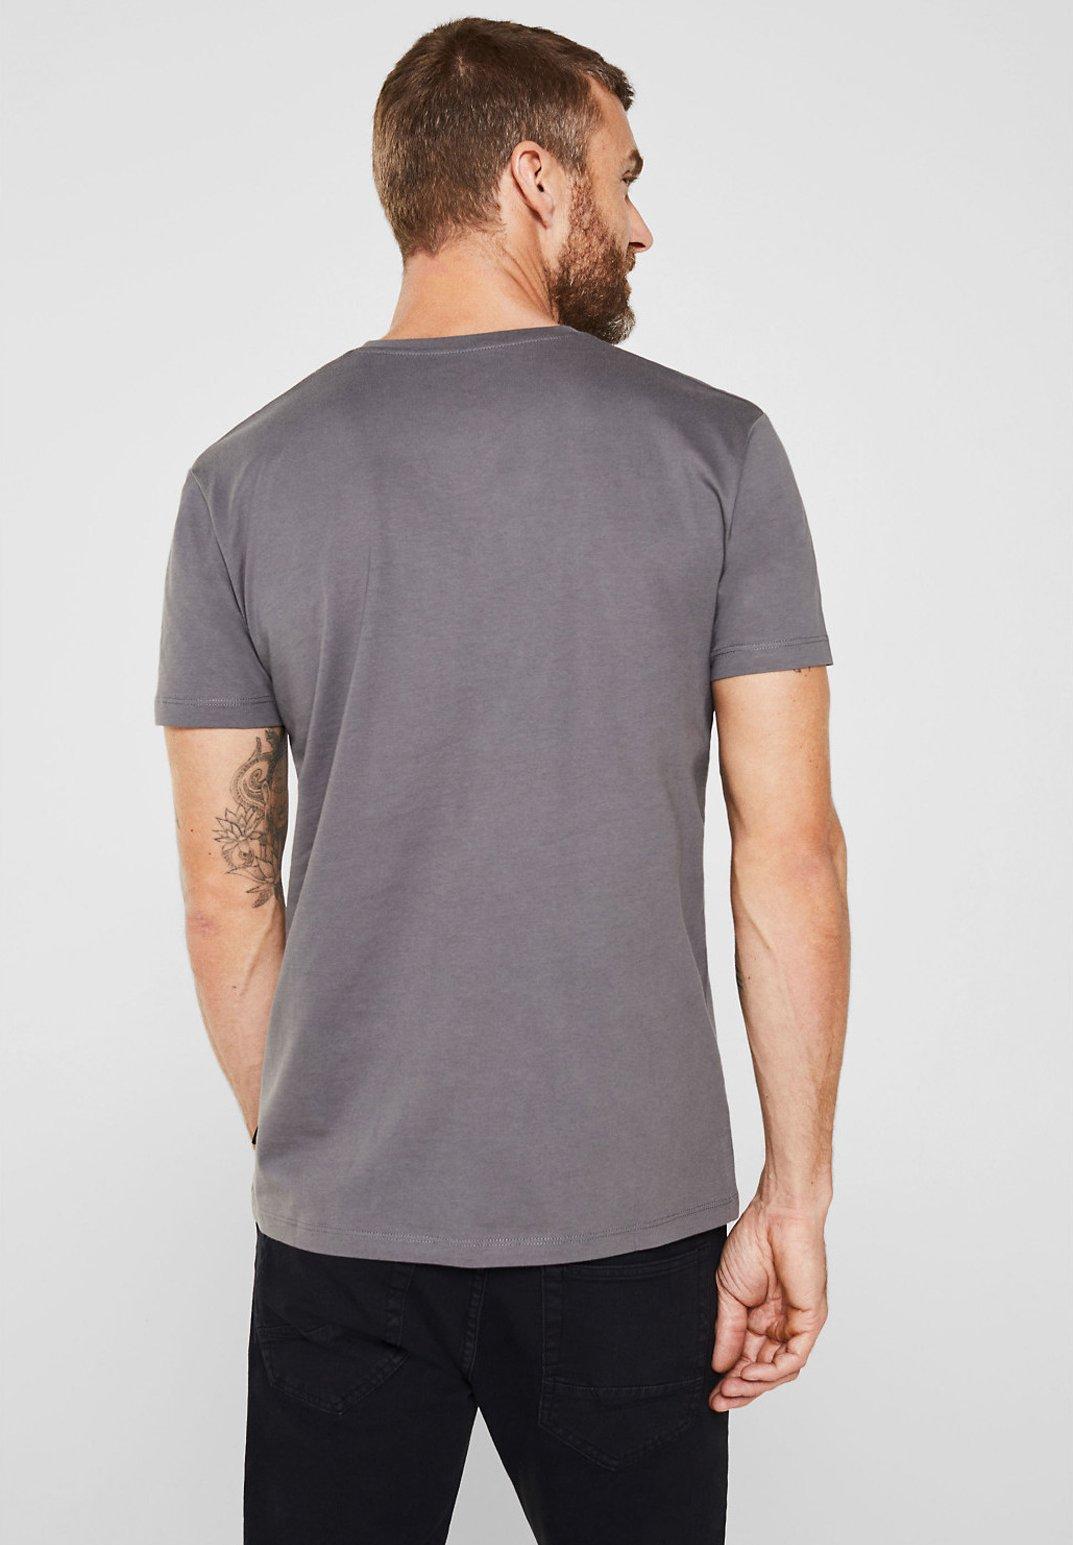 Esprit 2 Pack - T-shirt Basique Dark Grey